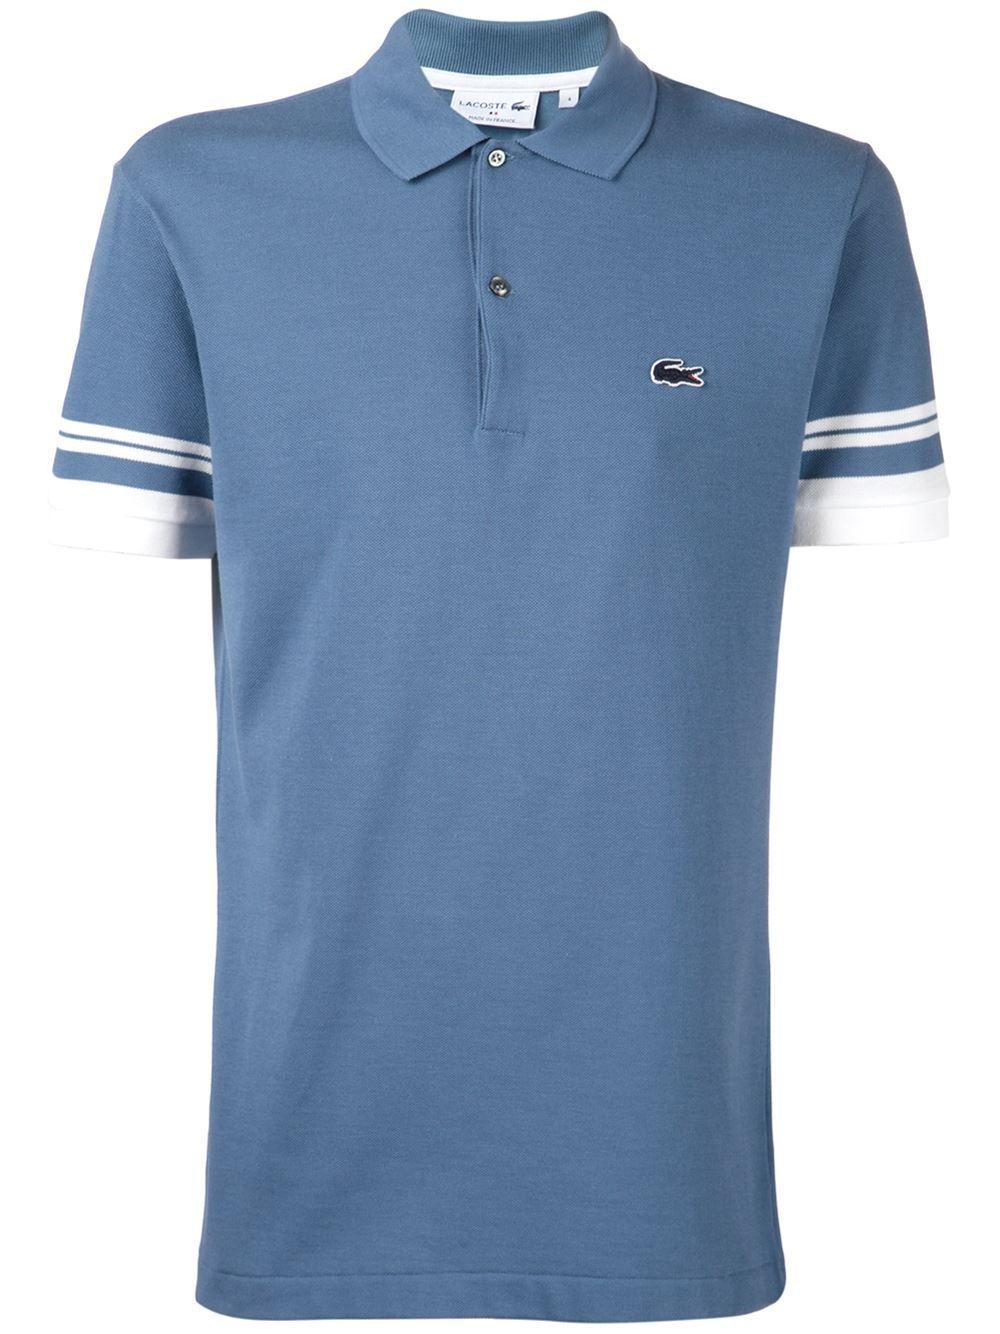 3100c251d7ae0 Lacoste Camisa Polo - Mario s - Farfetch.com